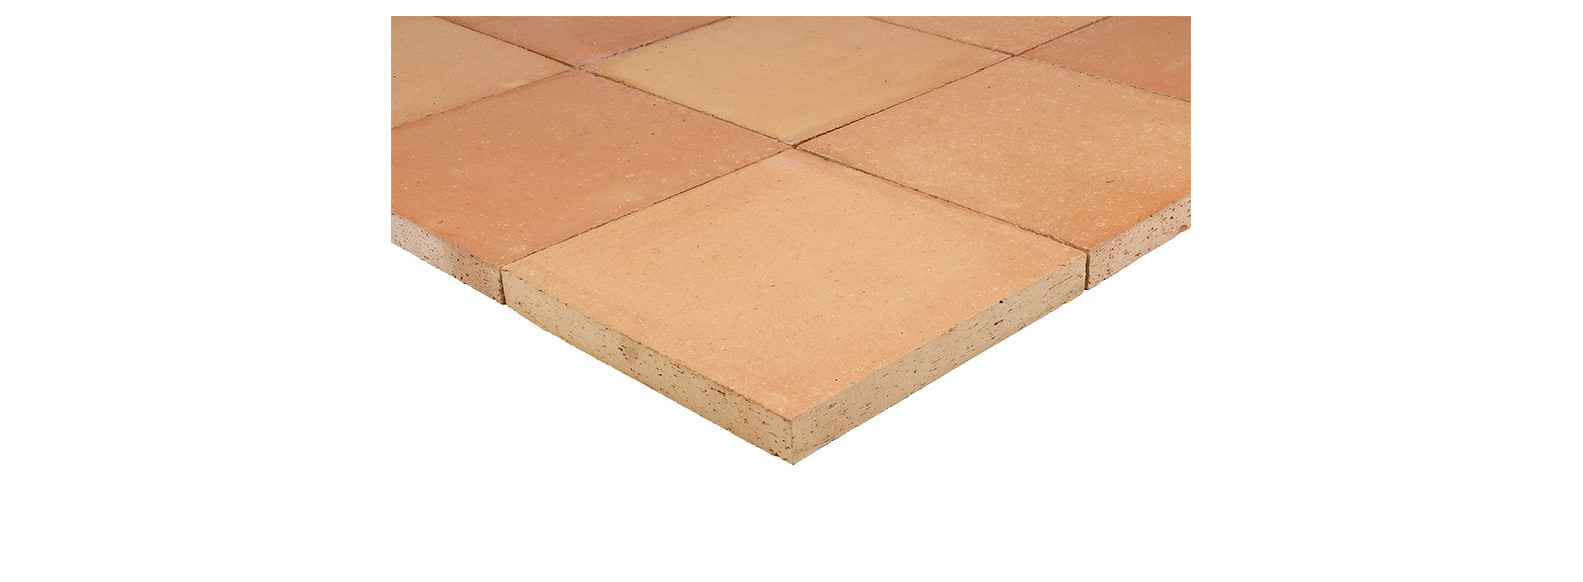 terre cuite de sol beige rosé